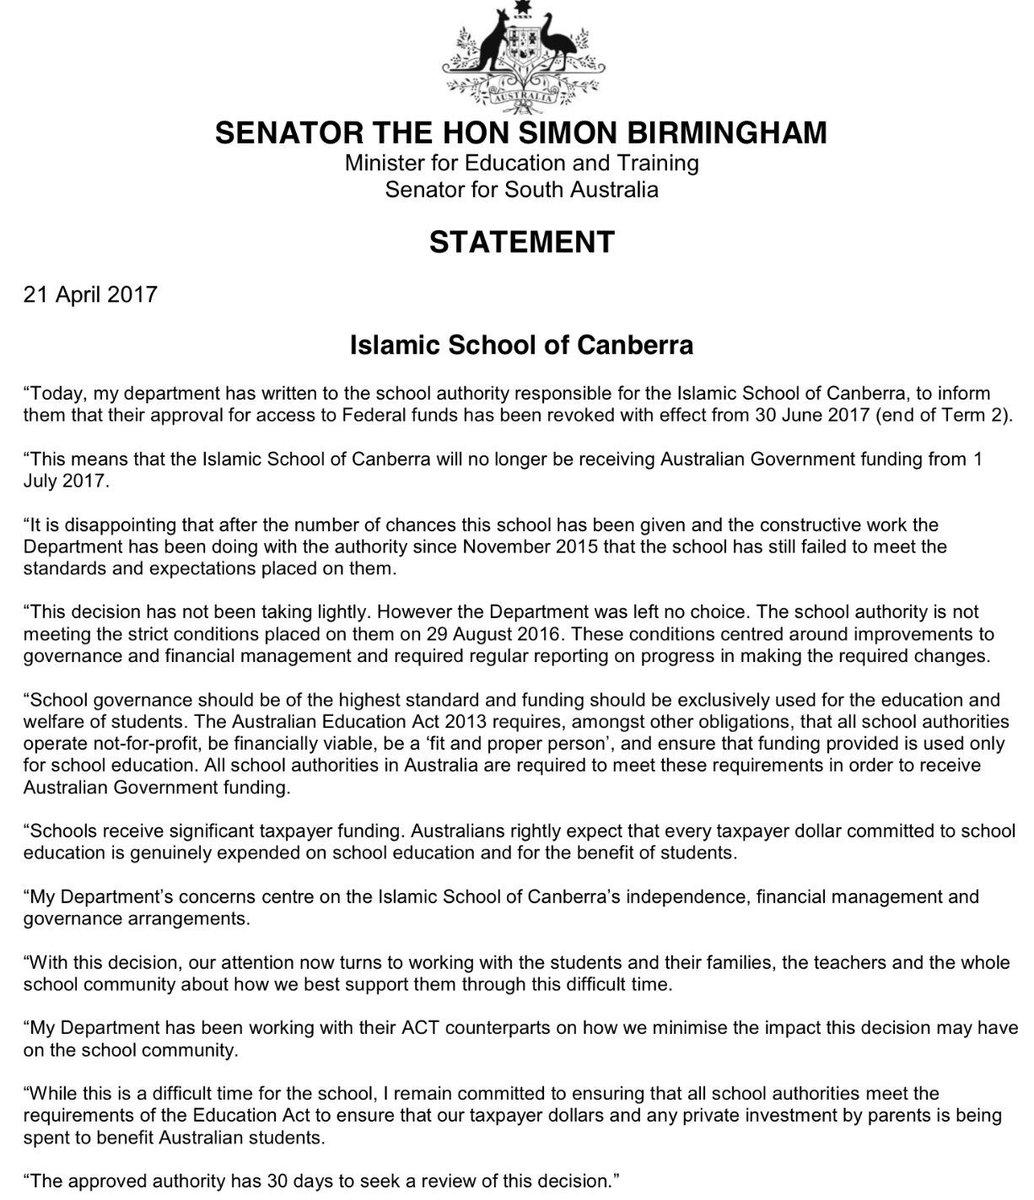 Simon Birmingham on Twitter: